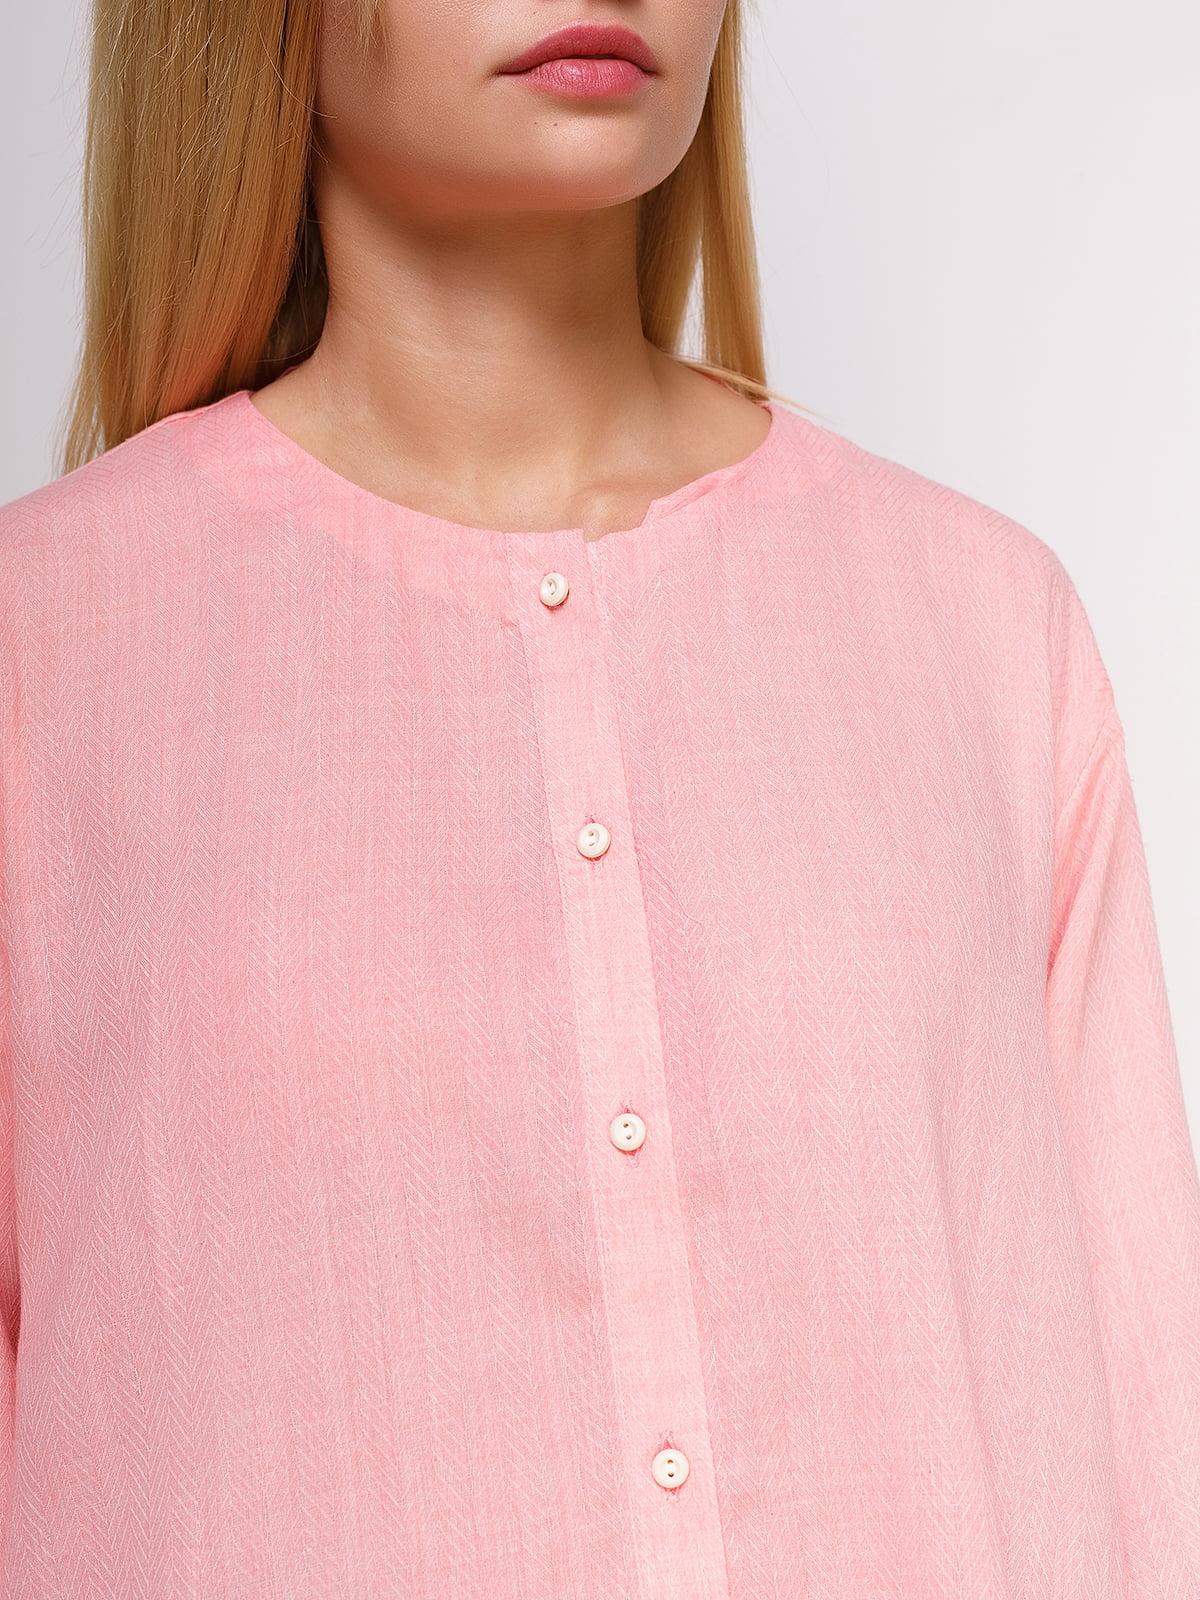 Рубашка розовая | 4495570 | фото 4